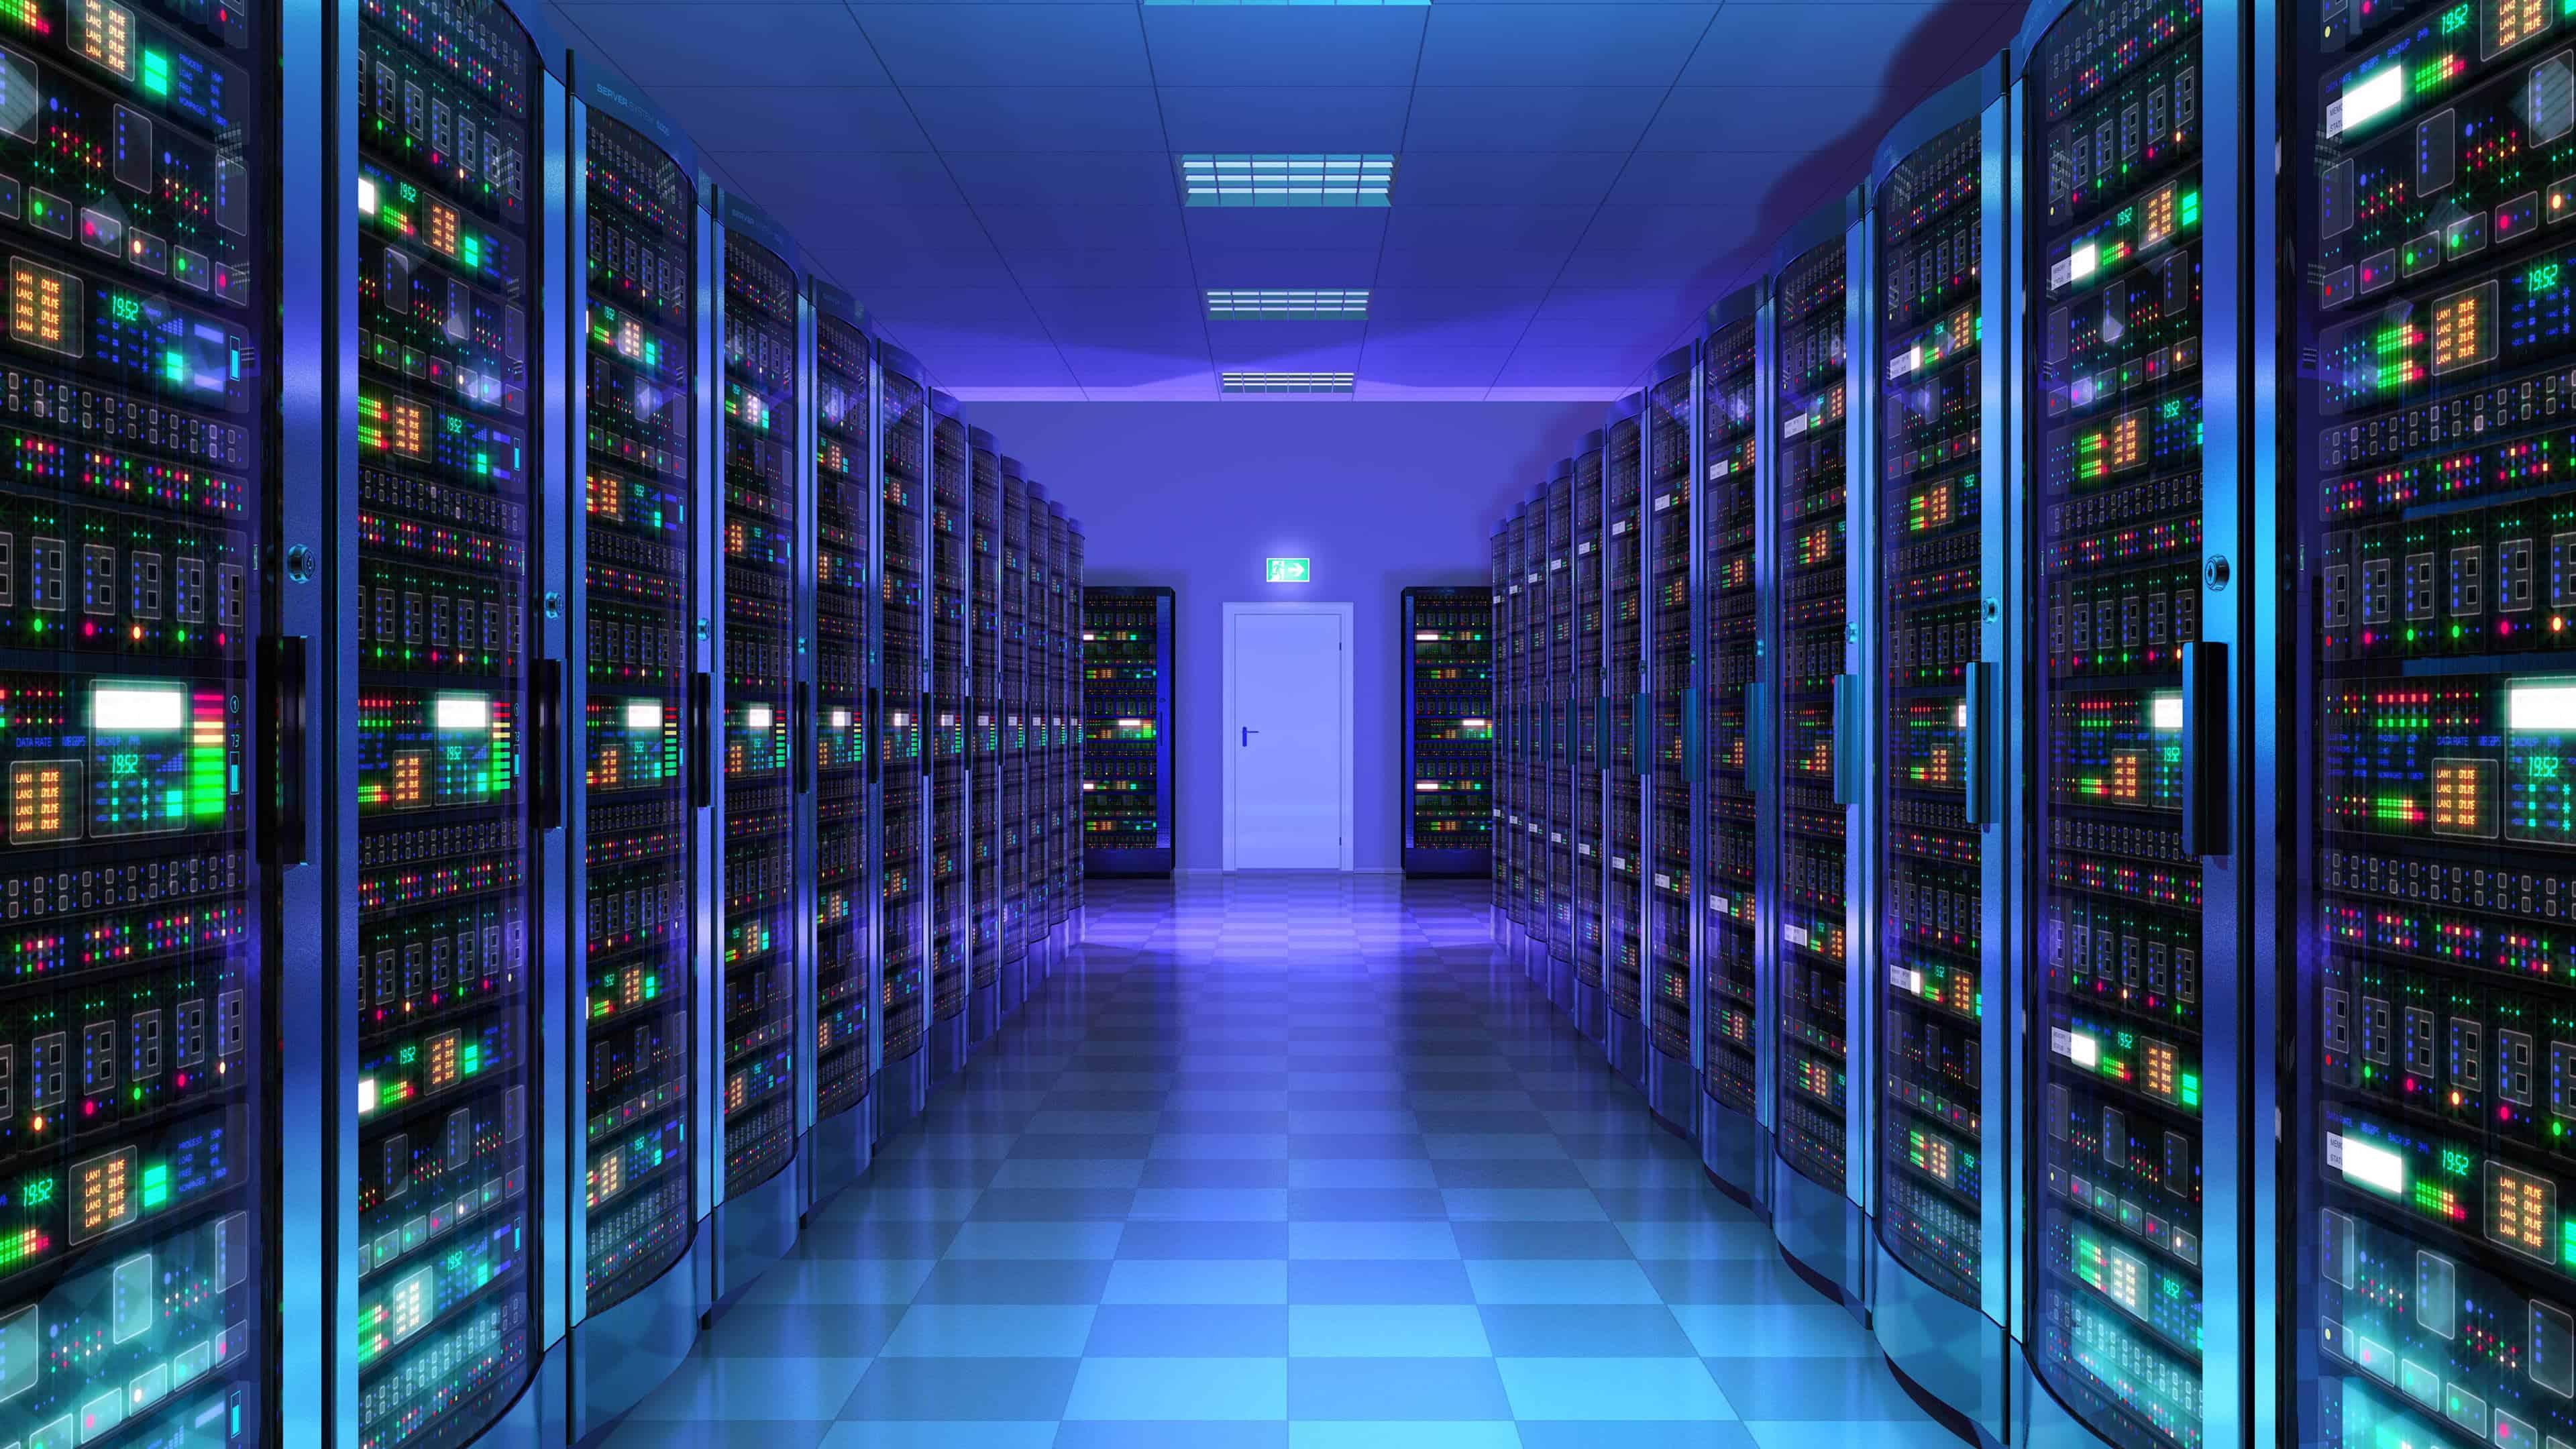 server room purple uhd 4k wallpaper